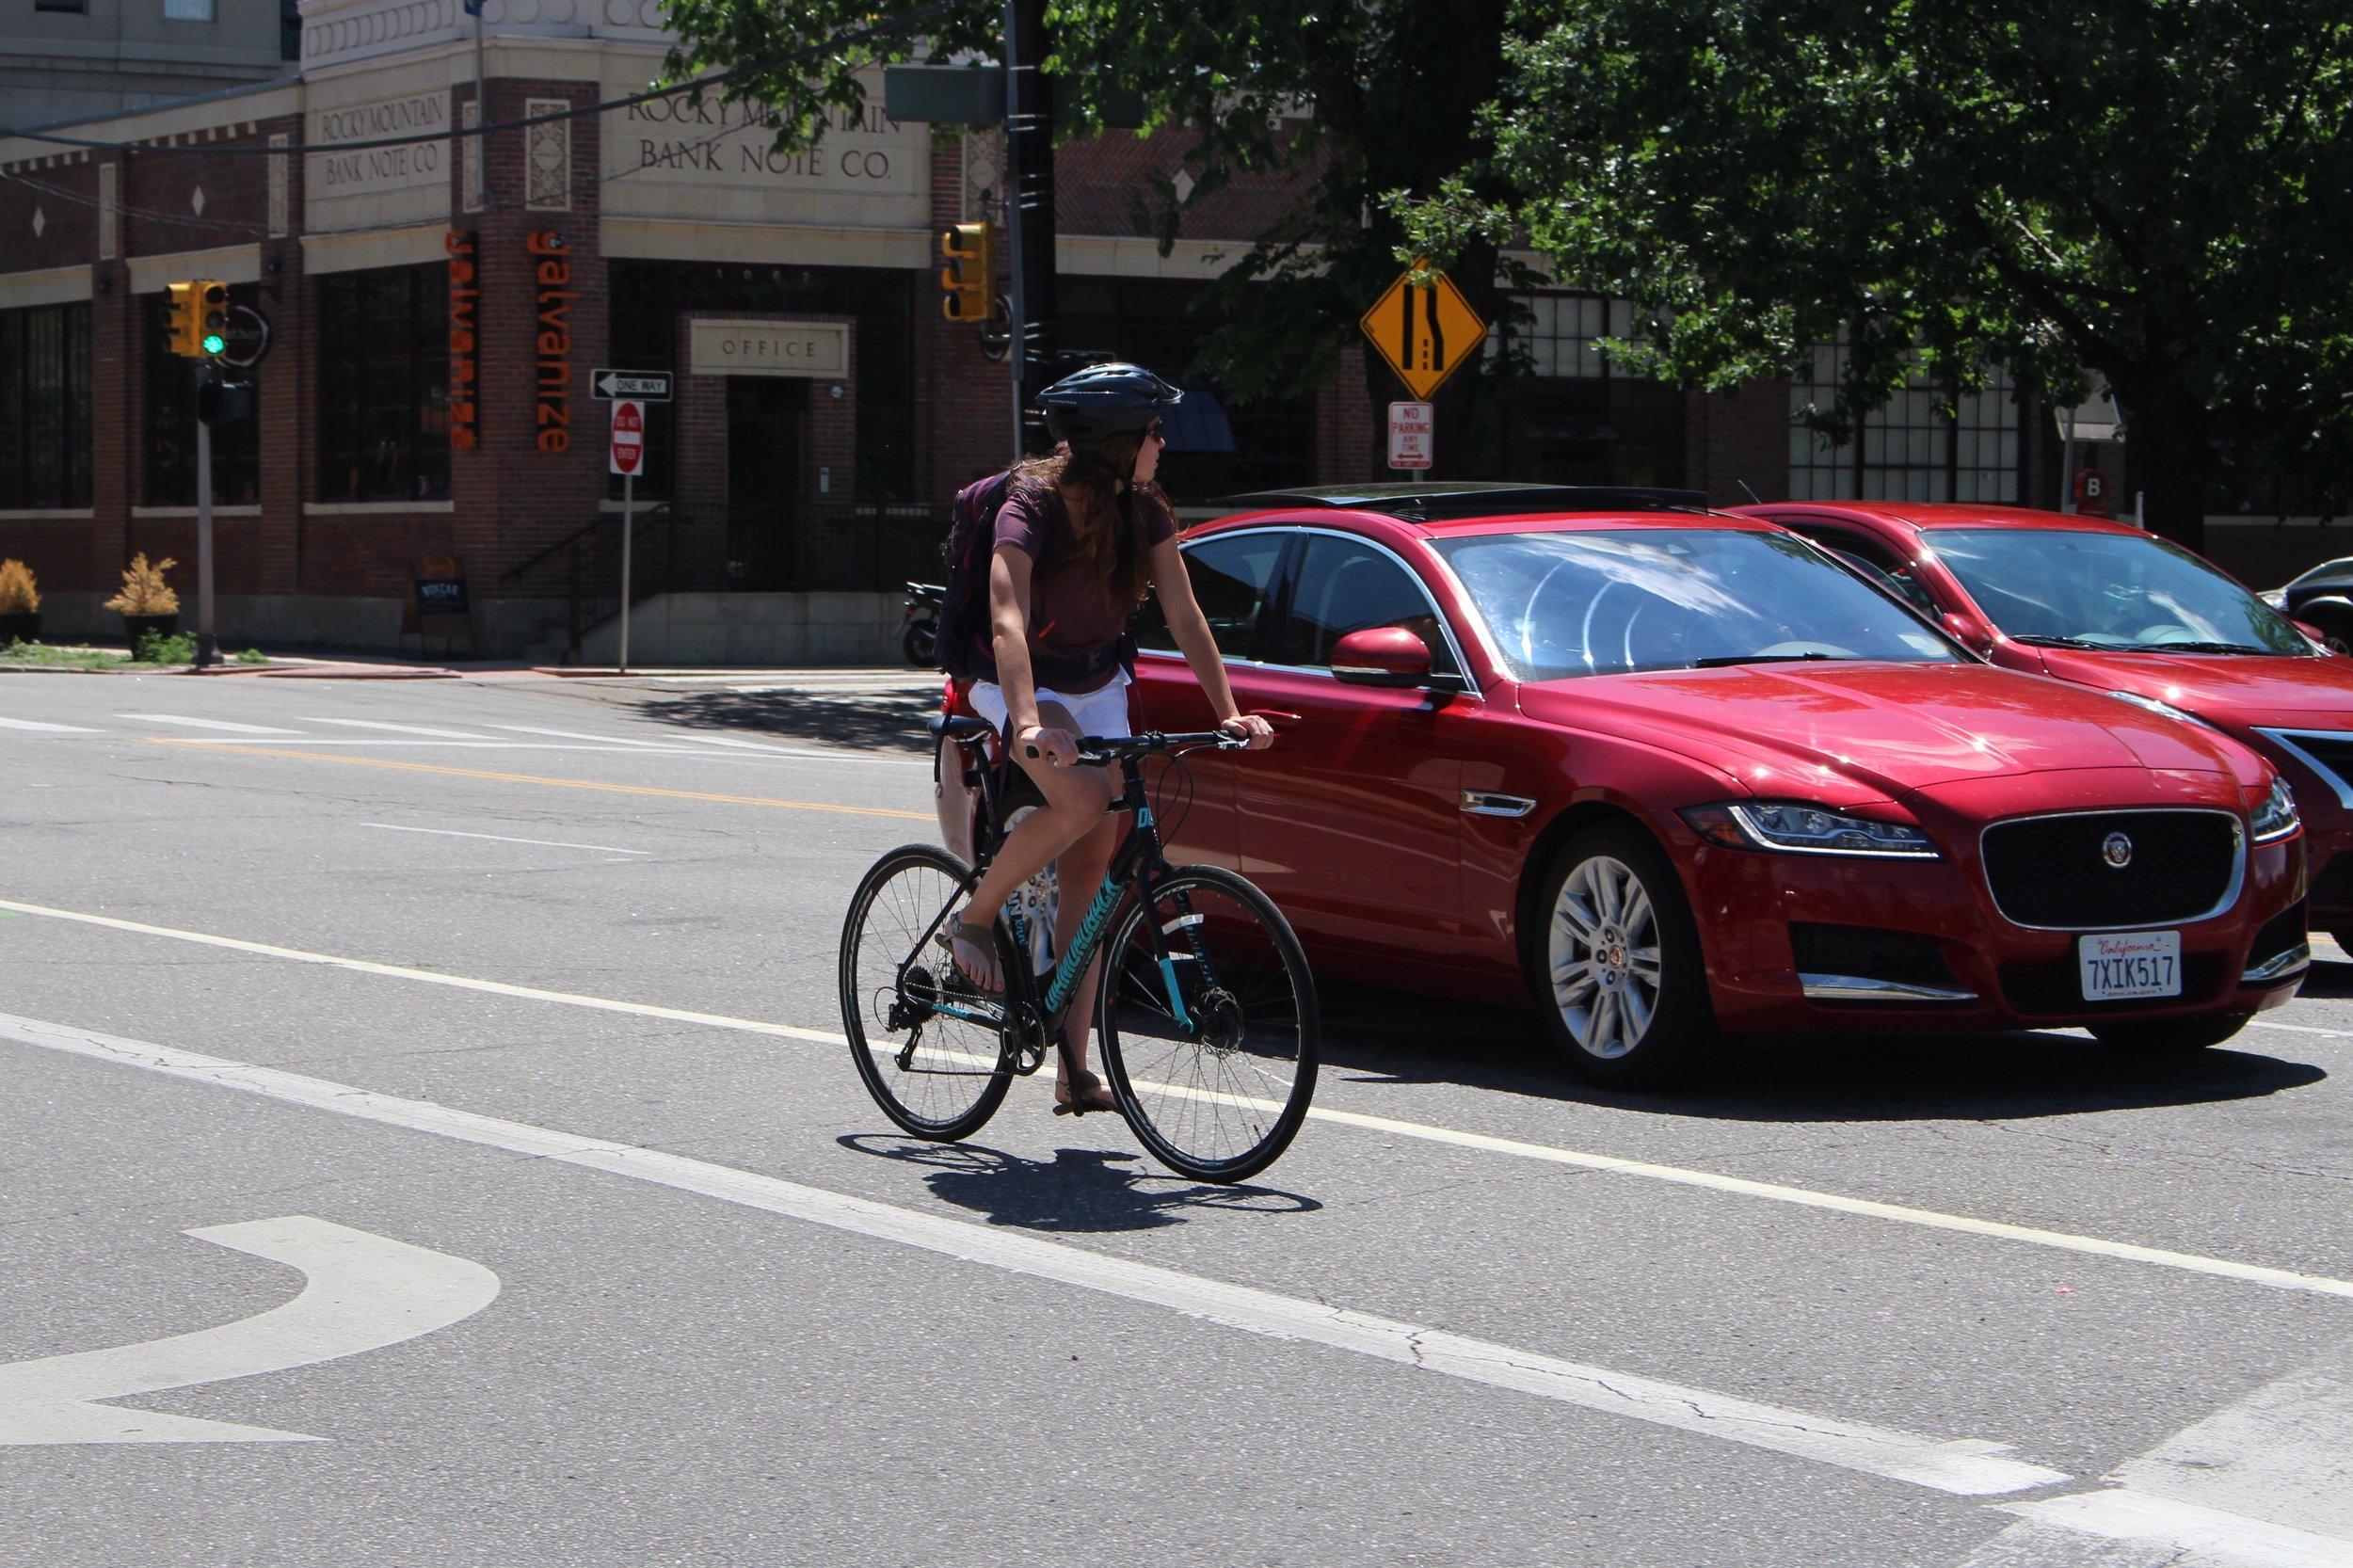 Cyclist in bike lane.jpg